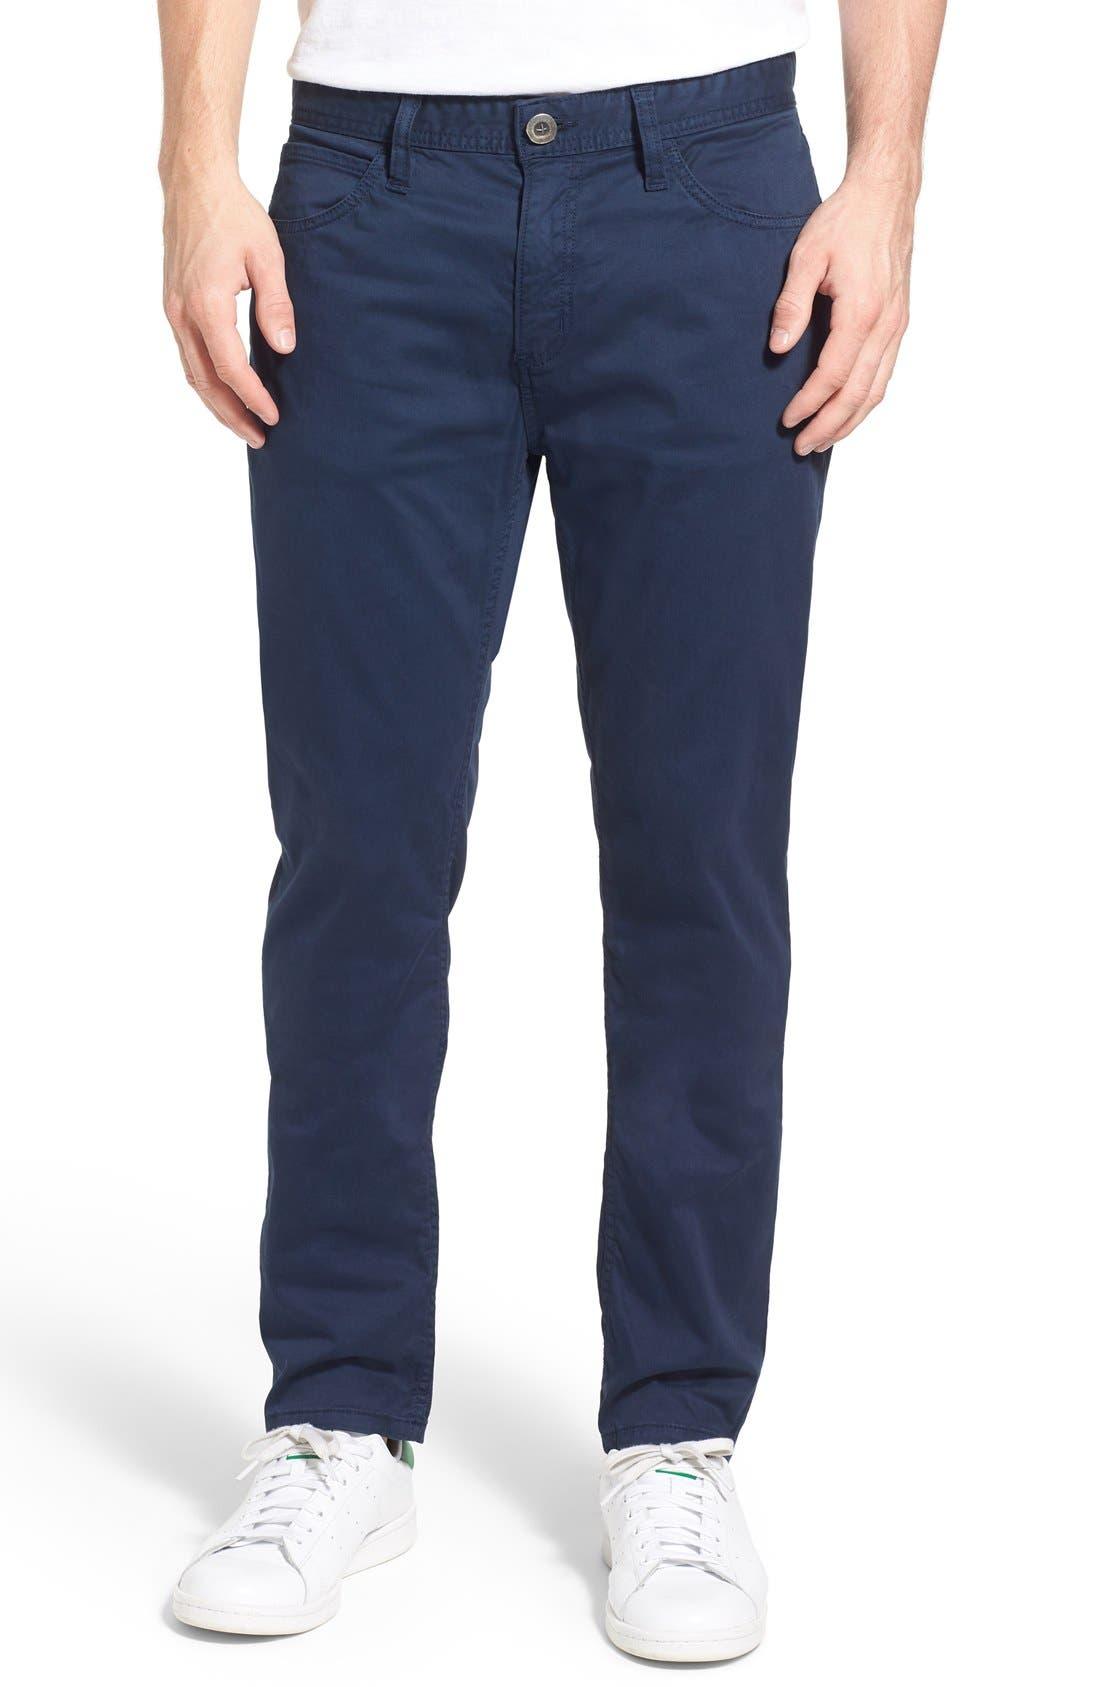 ORIGINAL PAPERBACKS Silverlake Pants